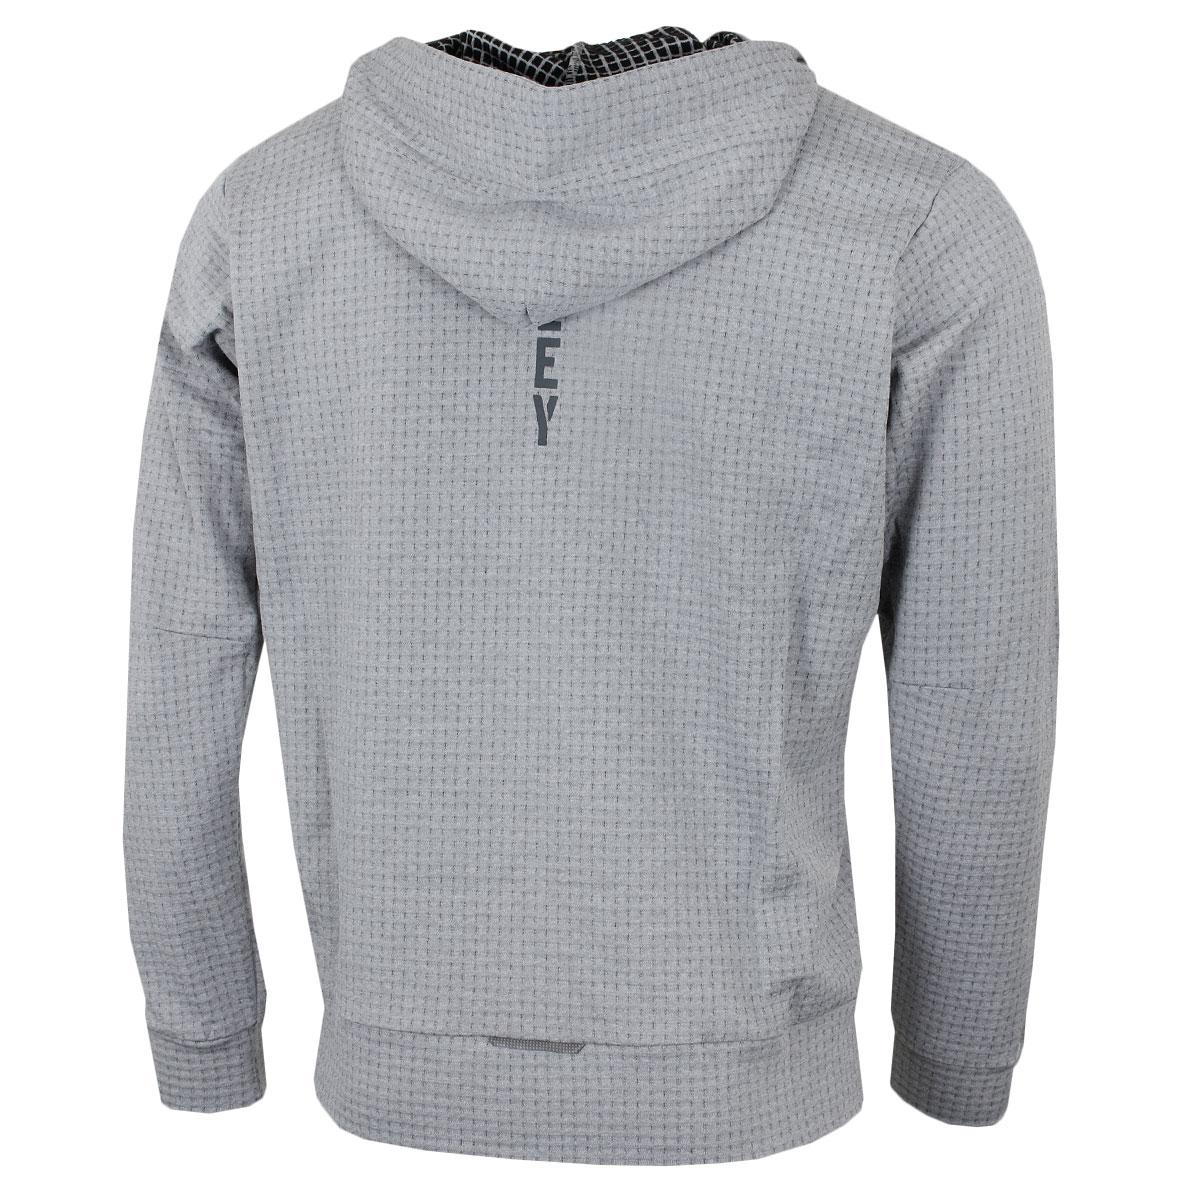 Oakley-Mens-Enhance-Tech-8-7-Quick-Drying-Fleece-Jacket-43-OFF-RRP thumbnail 7